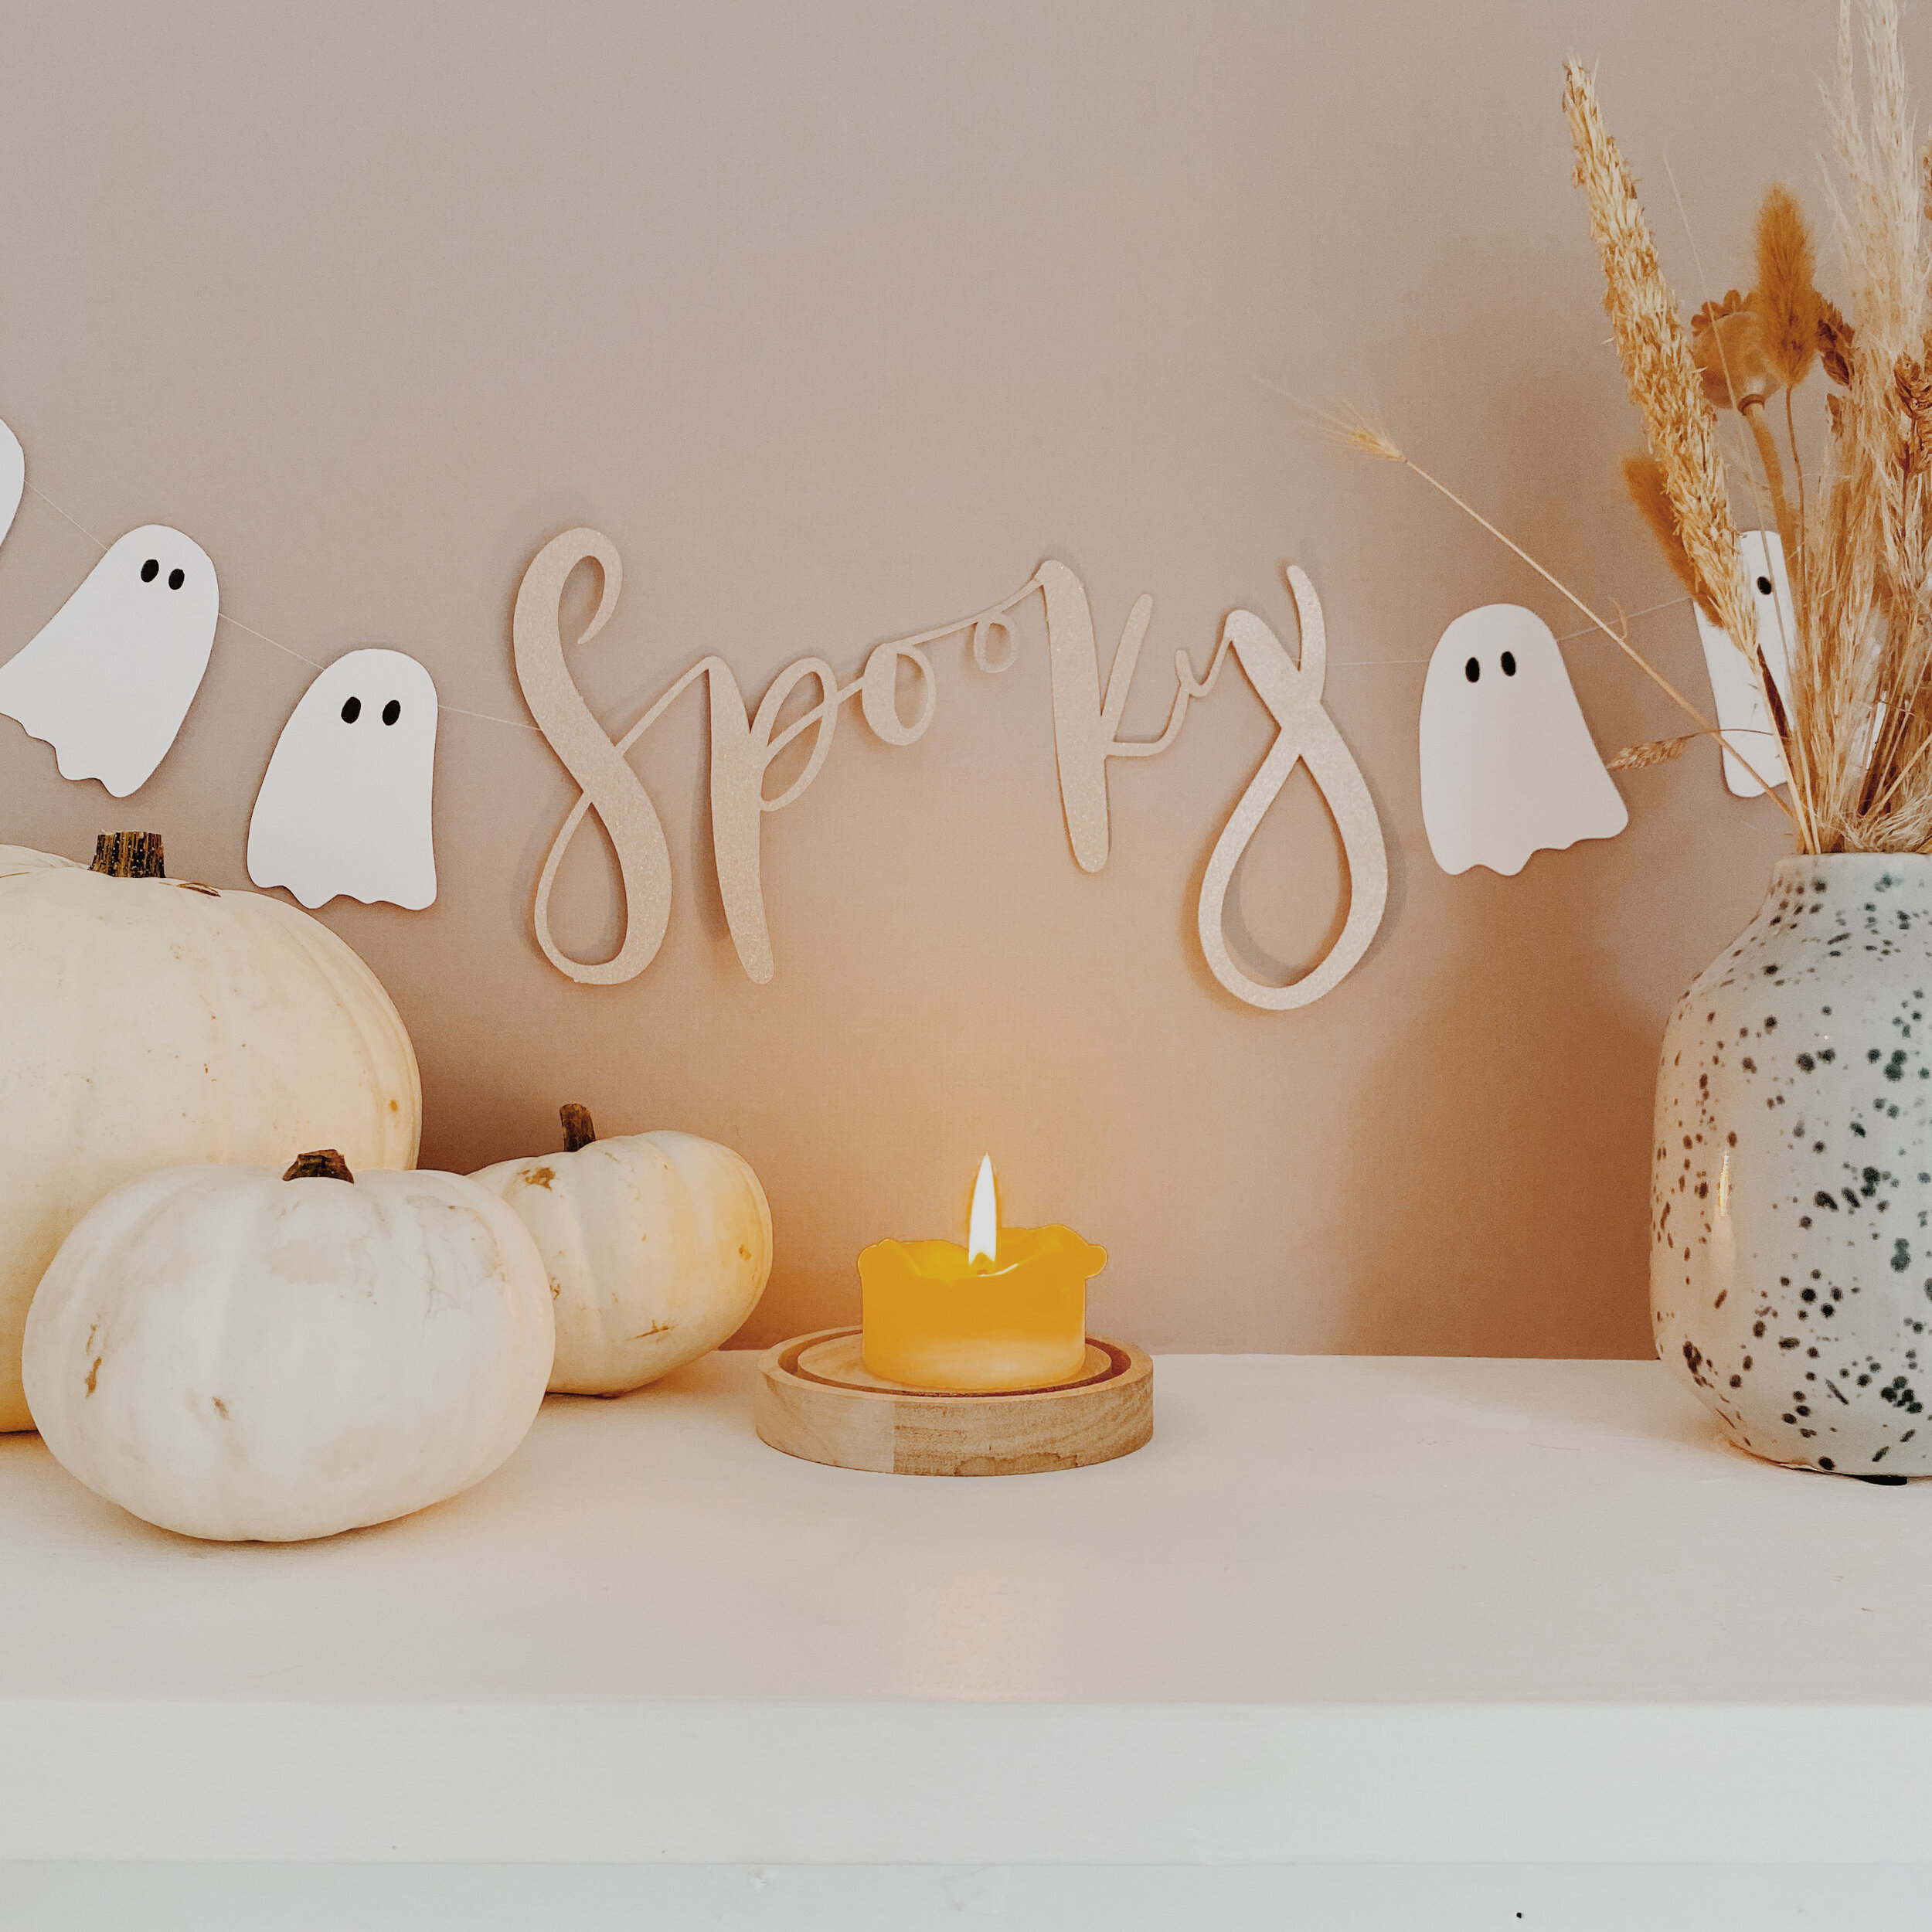 spooky halloween garland.jpg